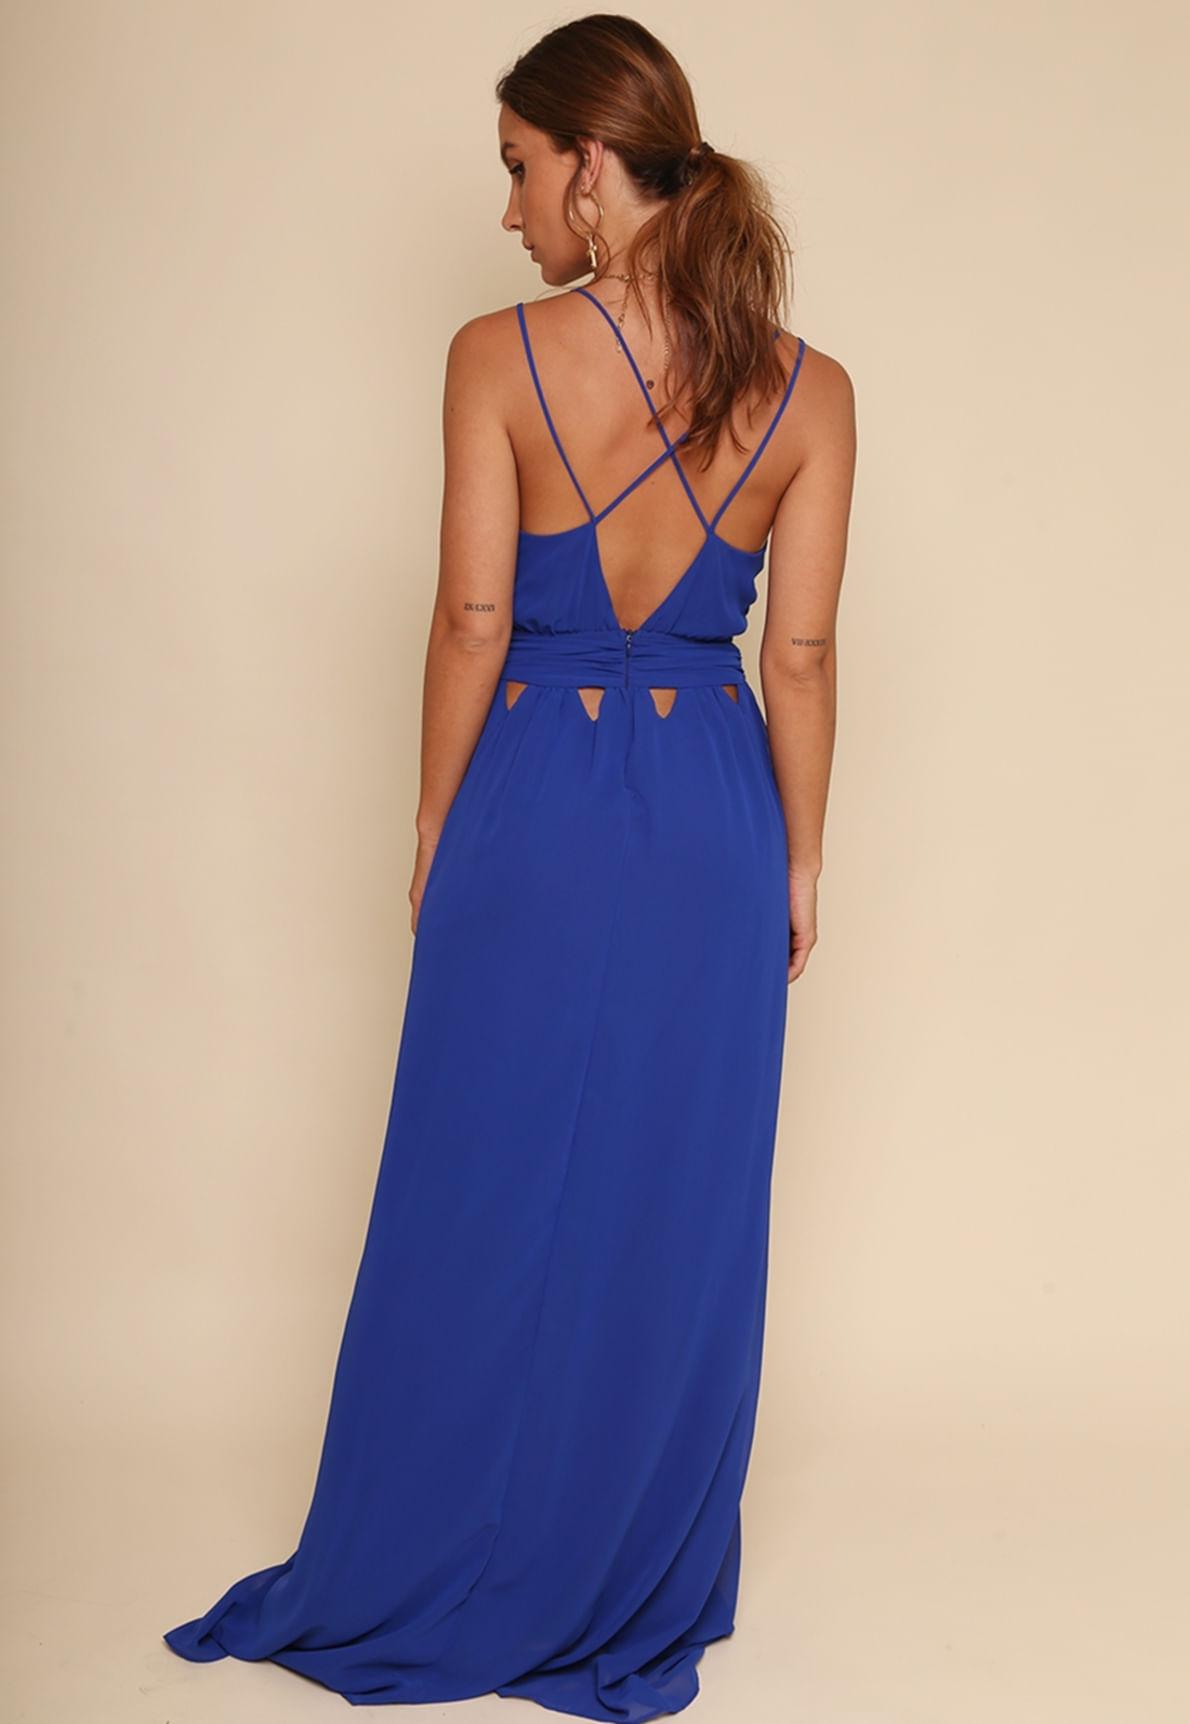 23211-vestido-longo-azul-royal-sandra-03